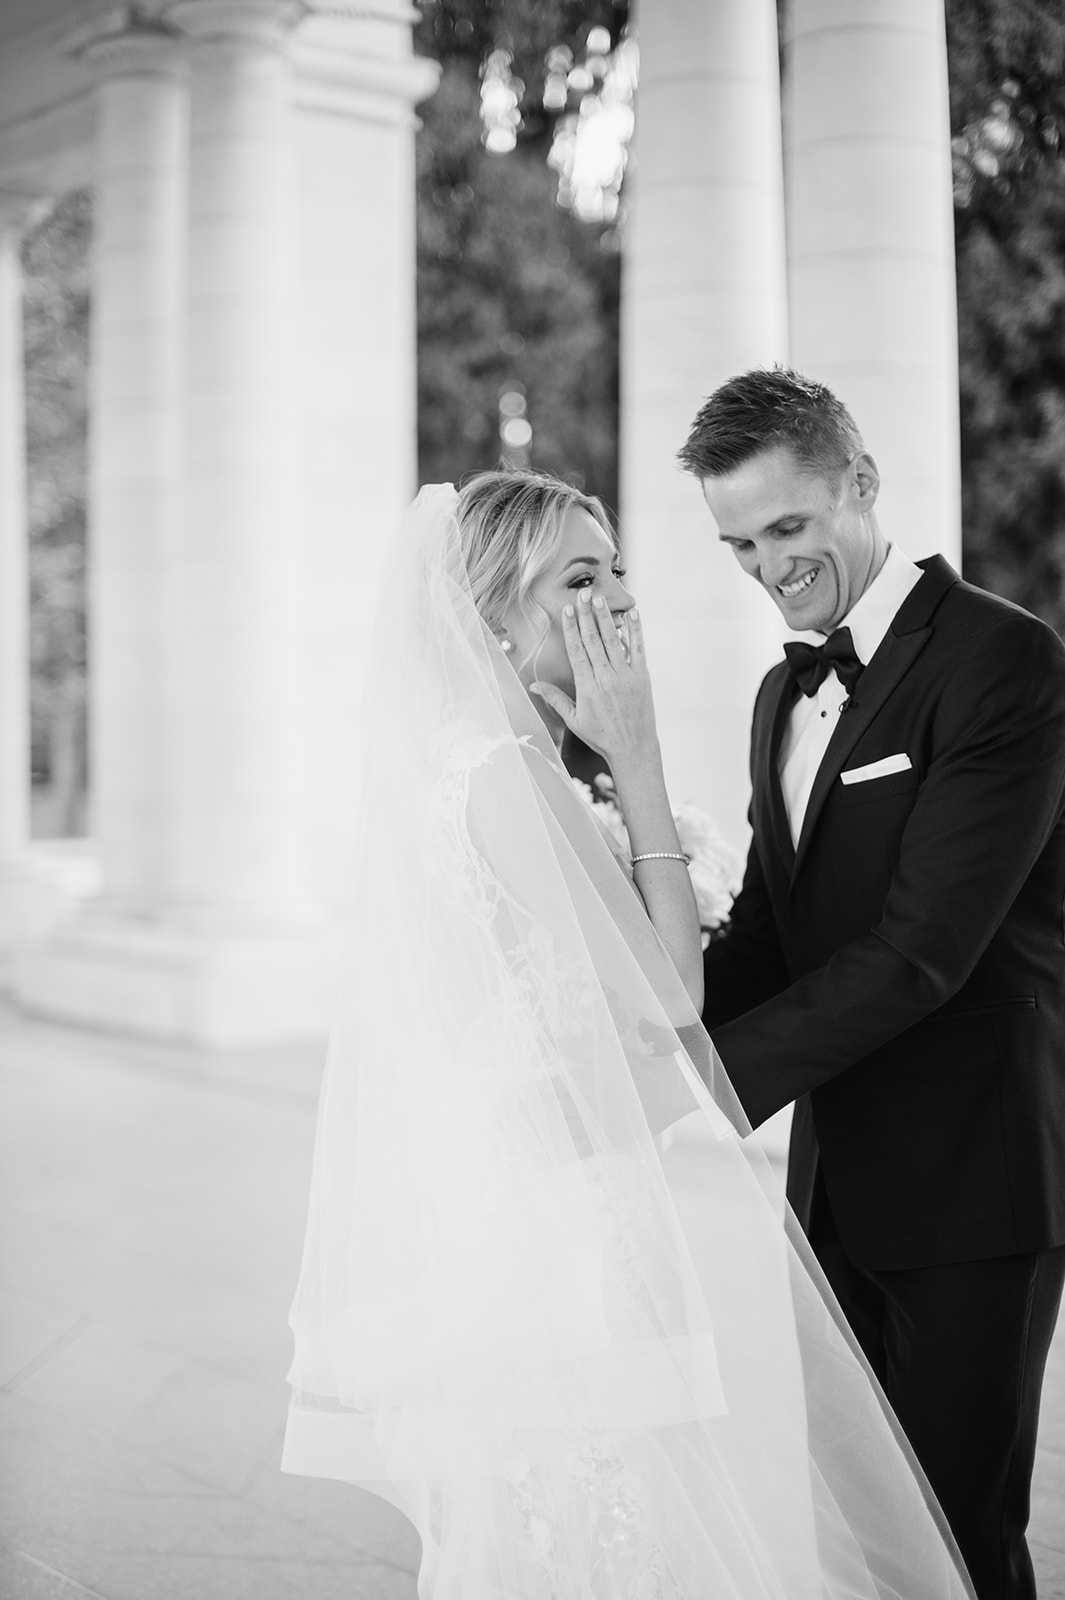 Sarah and John Wedding Day-Carrie King Photographer-121.jpg